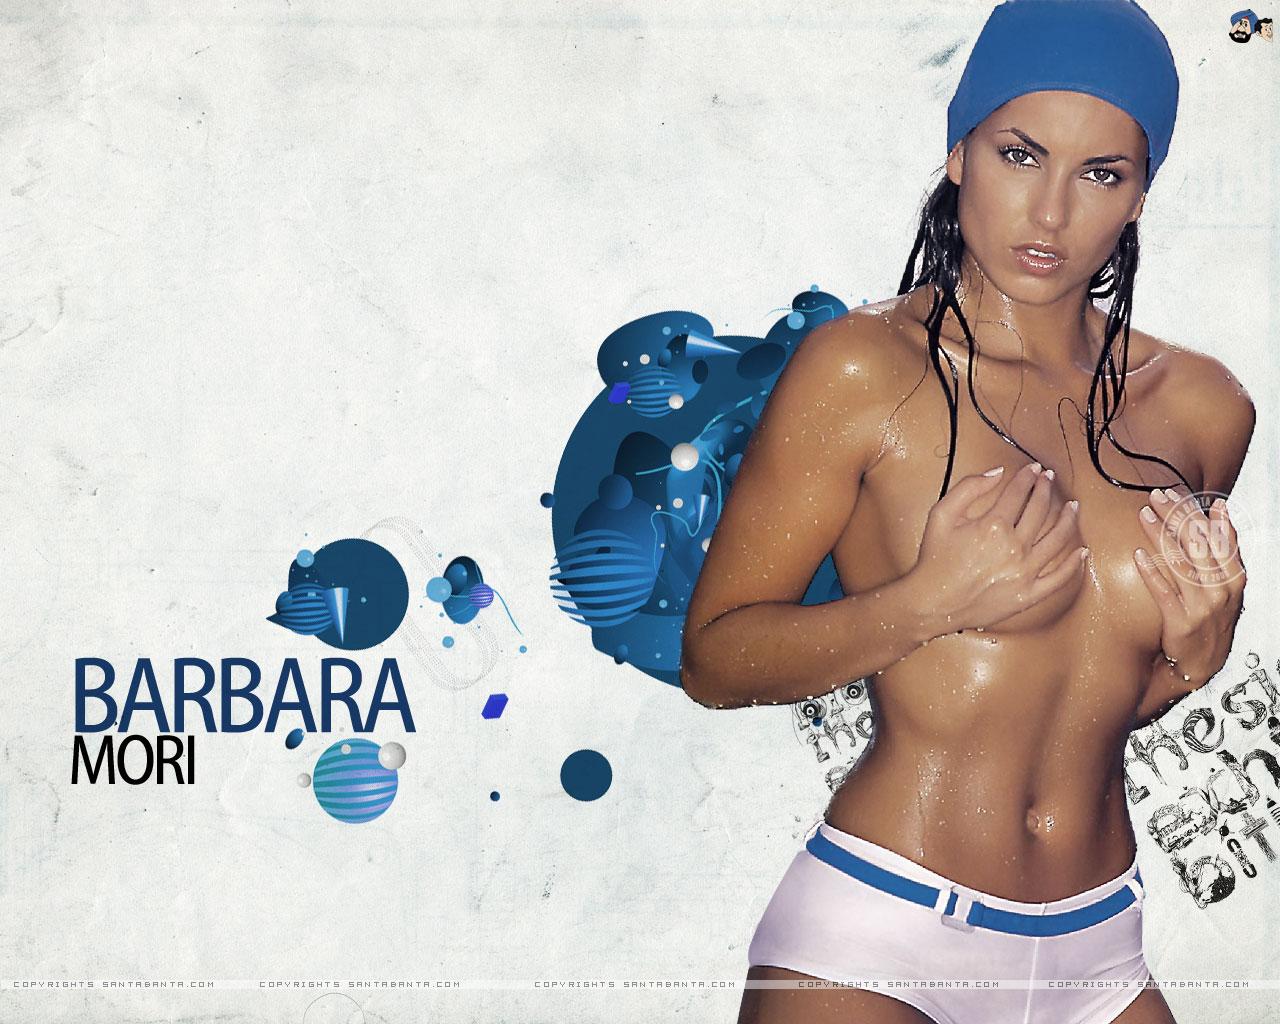 barbara mori nude sex pictures